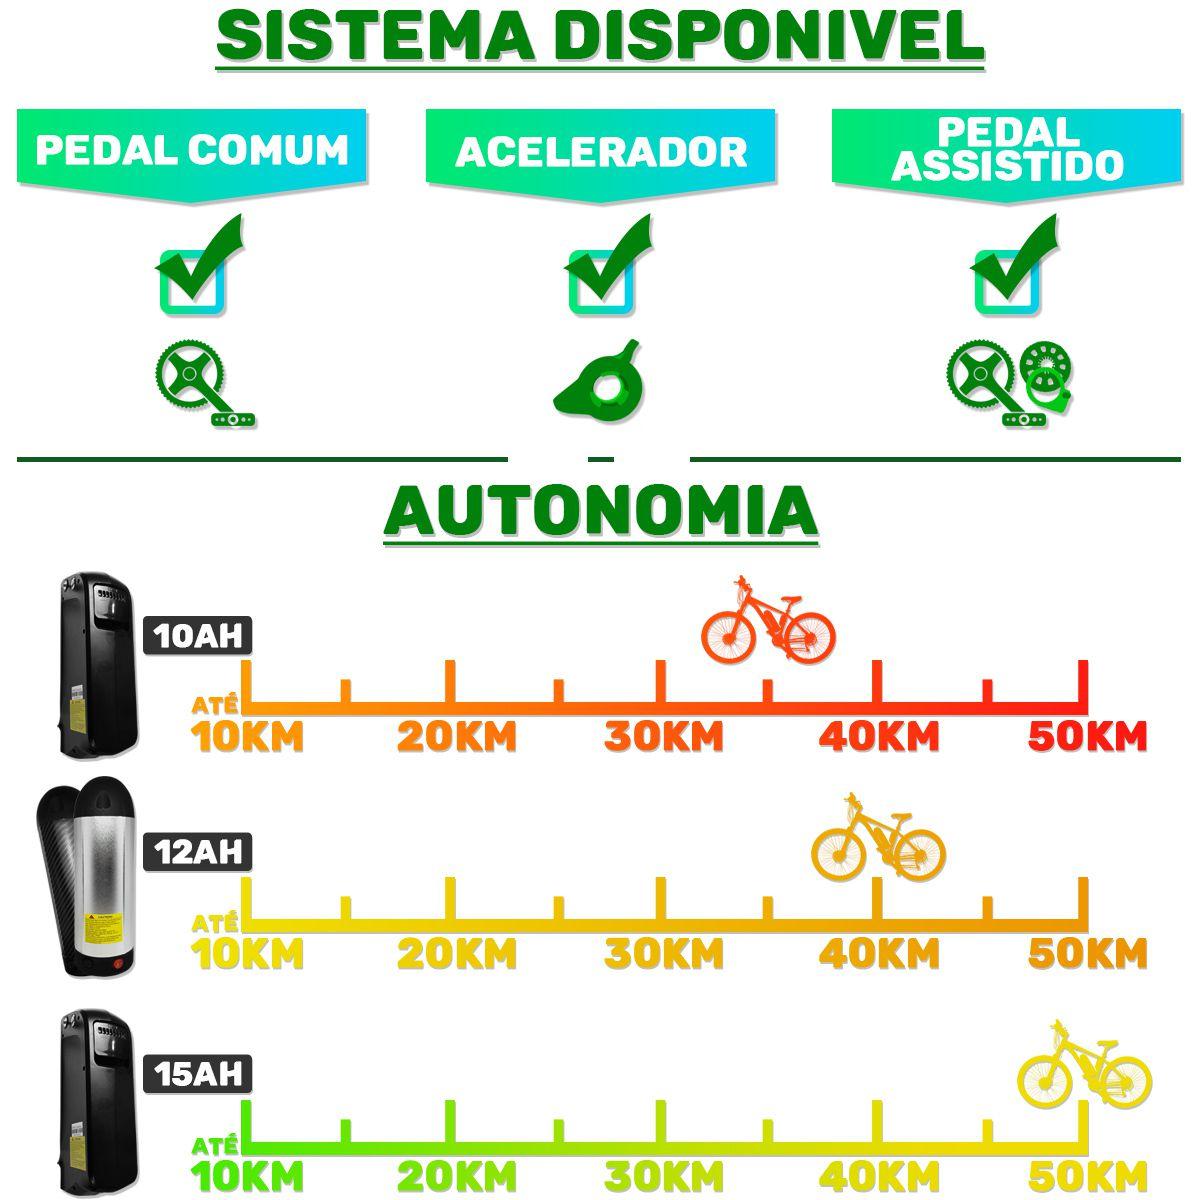 Bicicleta Elétrica Aro 29 AL. Bateria de Litio TecUltra - 500 watts